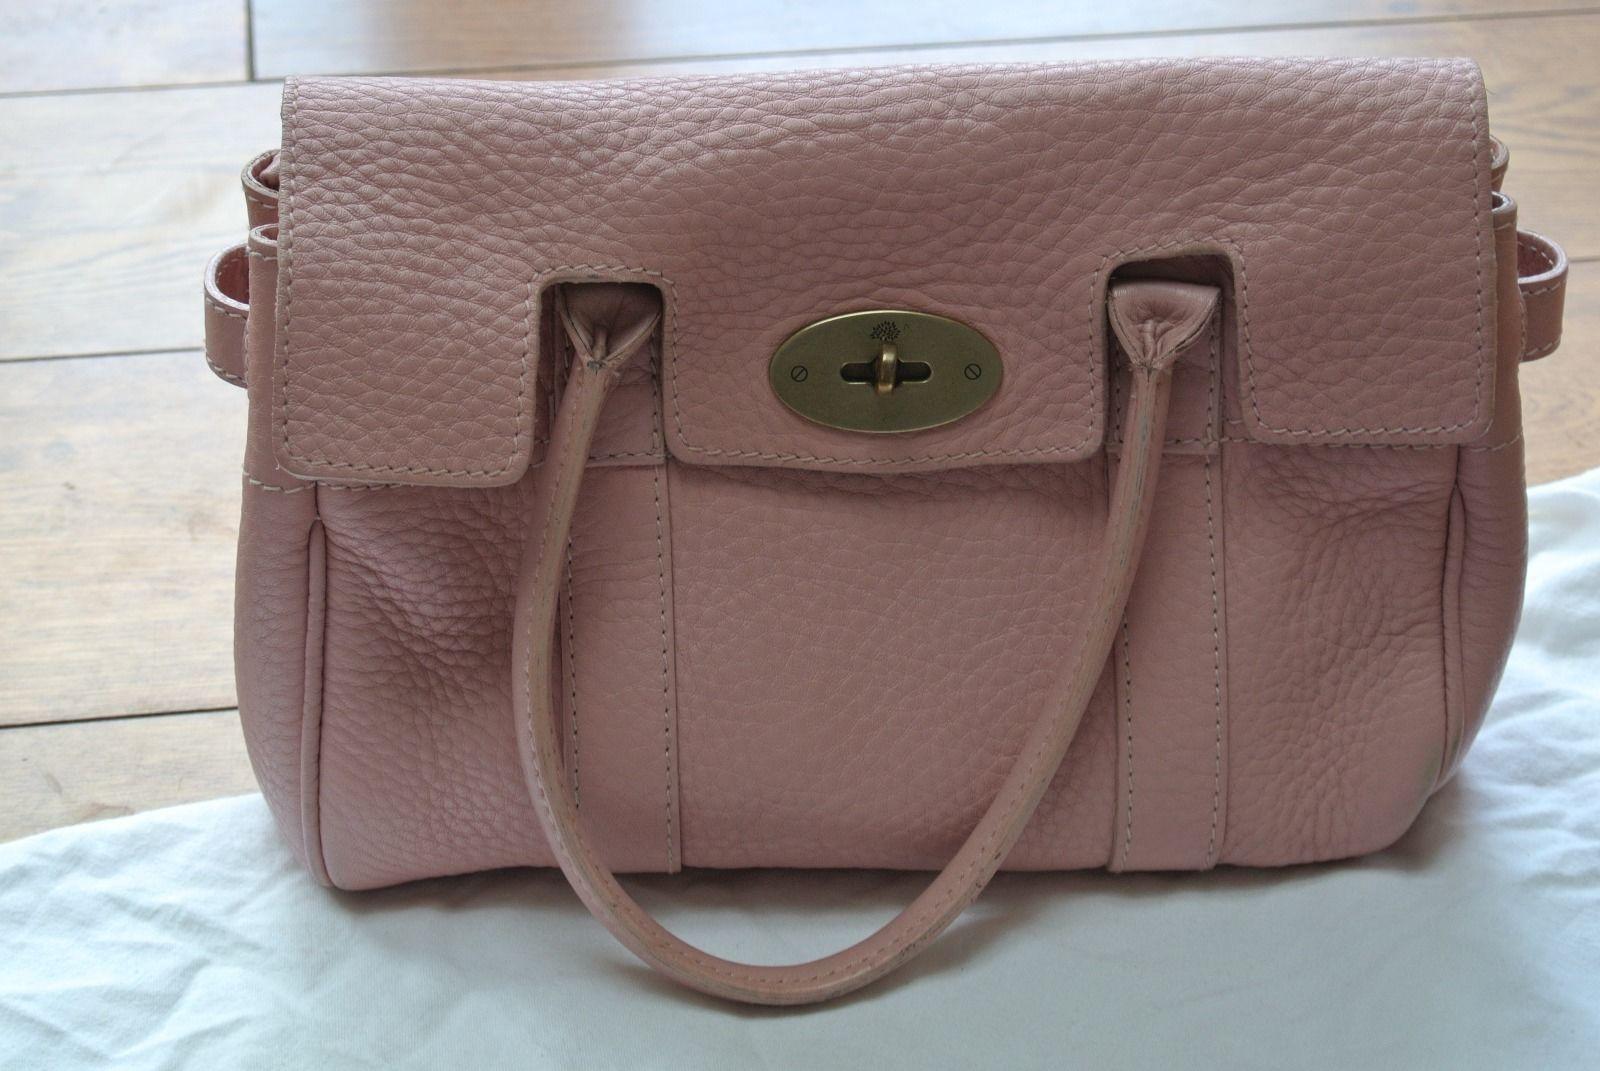 ... bayswater a7c4a 00bf8  new style baby pink mulberry ledbury handbag  d41a5 df643 54836461c8c9c